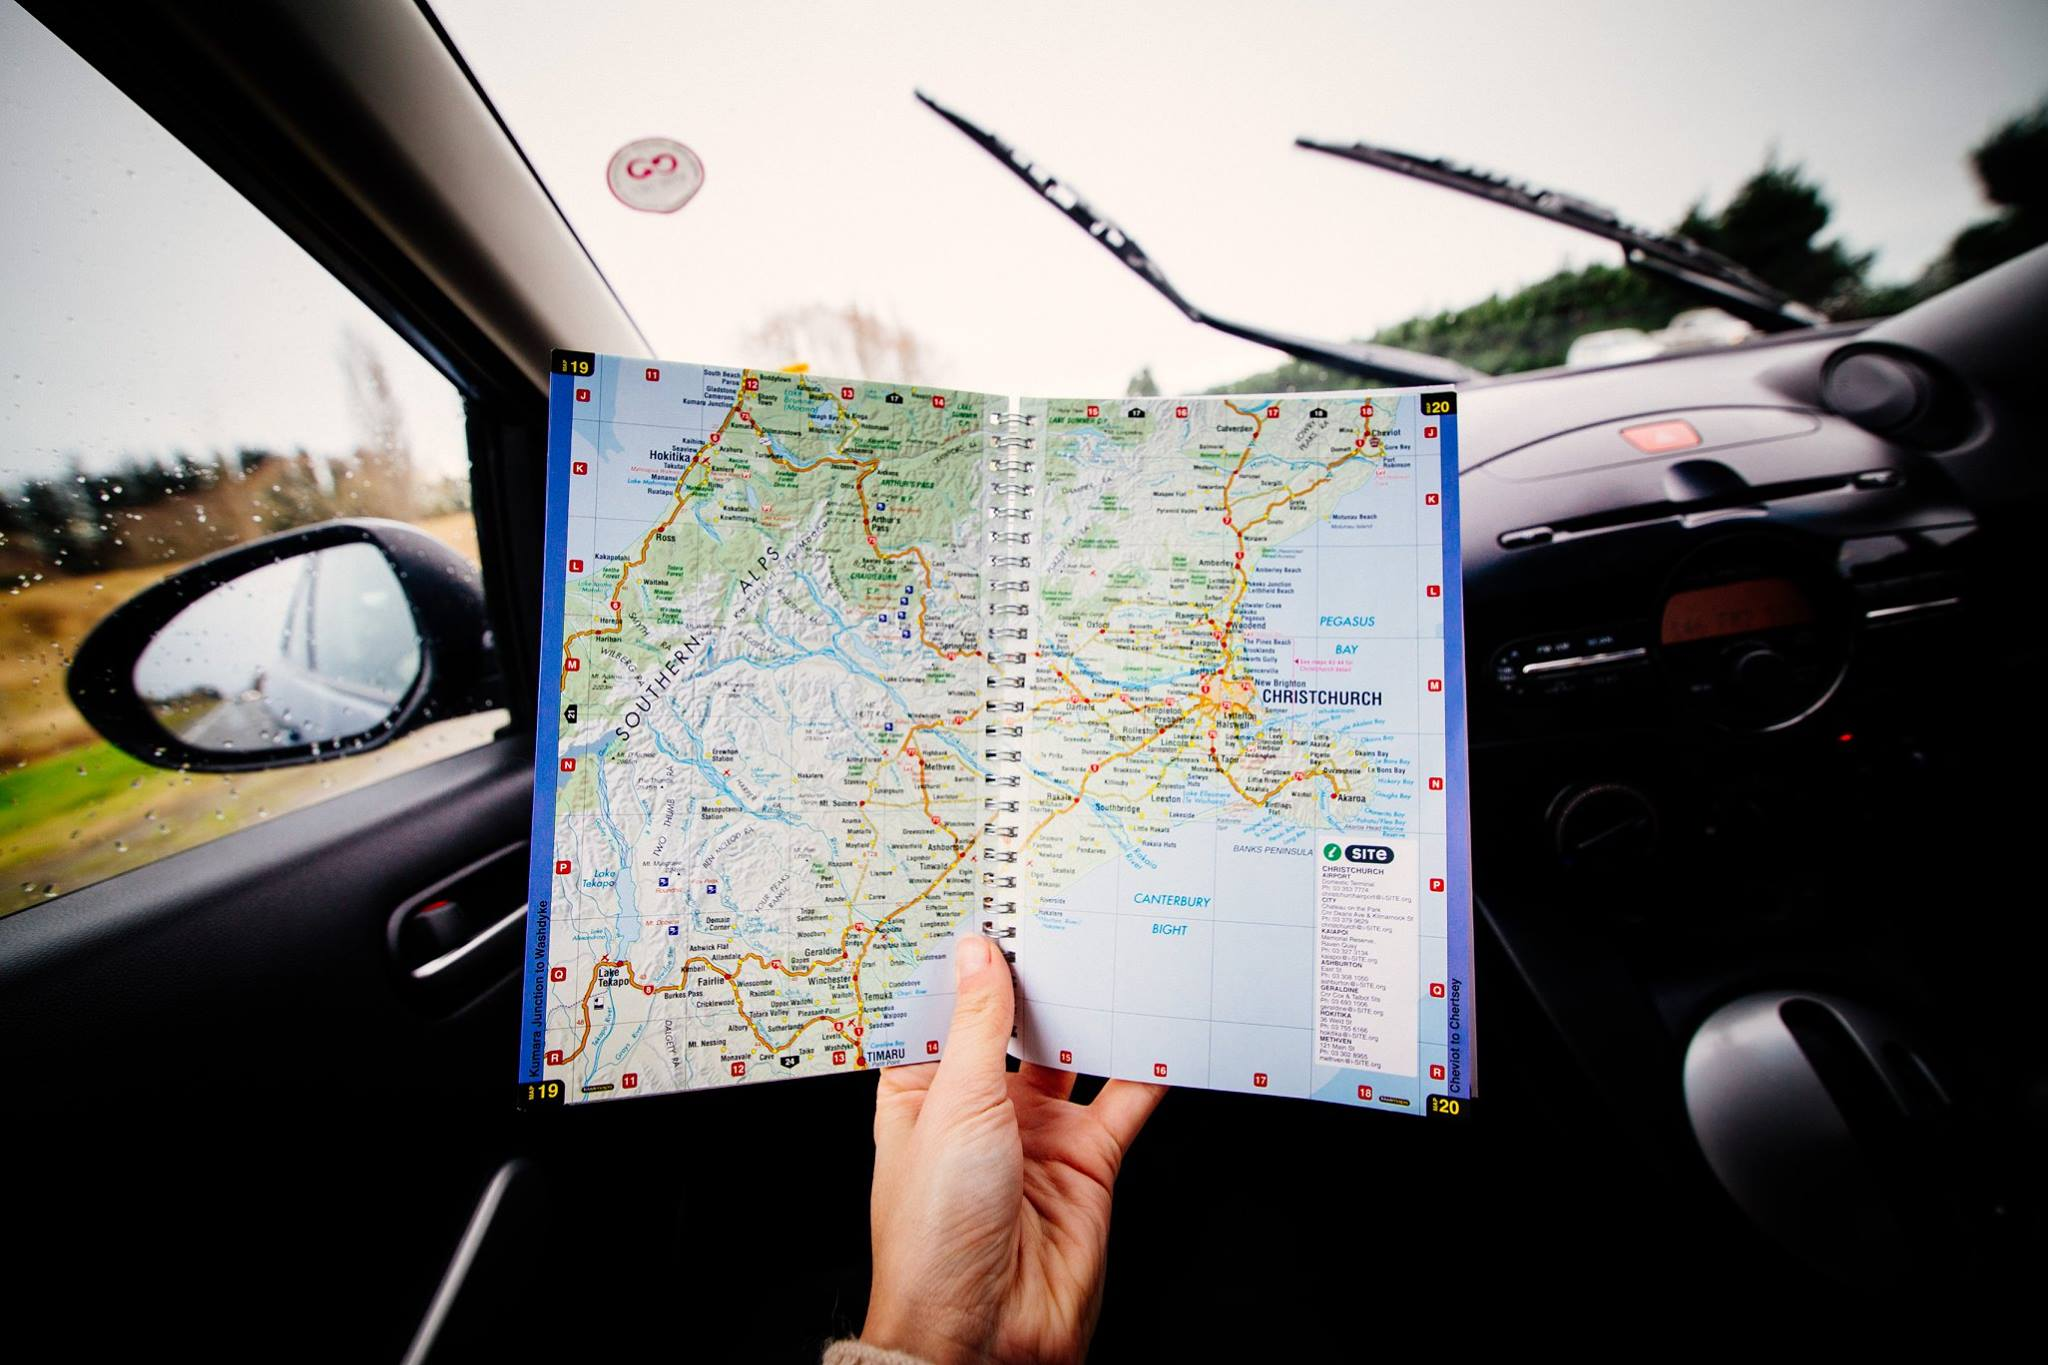 On the way to Kaikoura from Christchurch. Photo: Marine Raynard